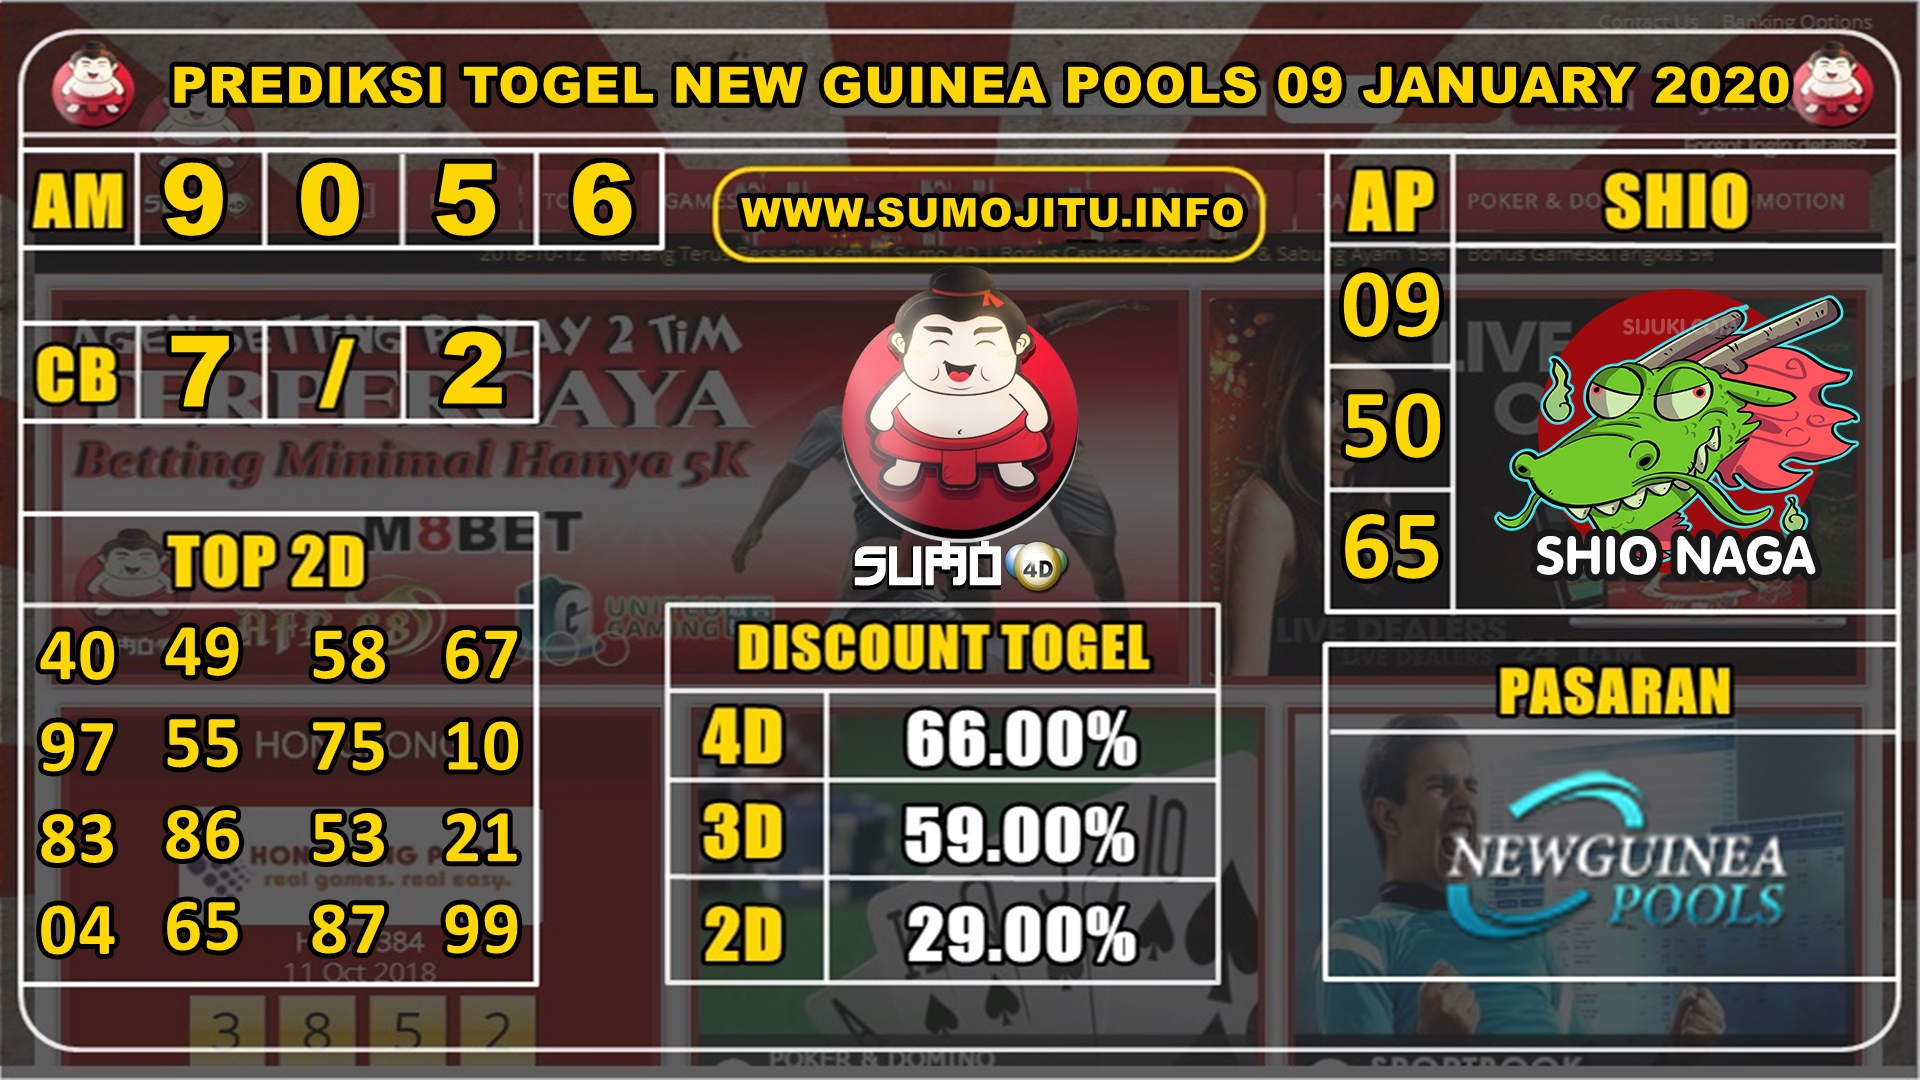 PREDIKSI TOGEL NEW GUINEA POOLS 09 JANUARY 2020